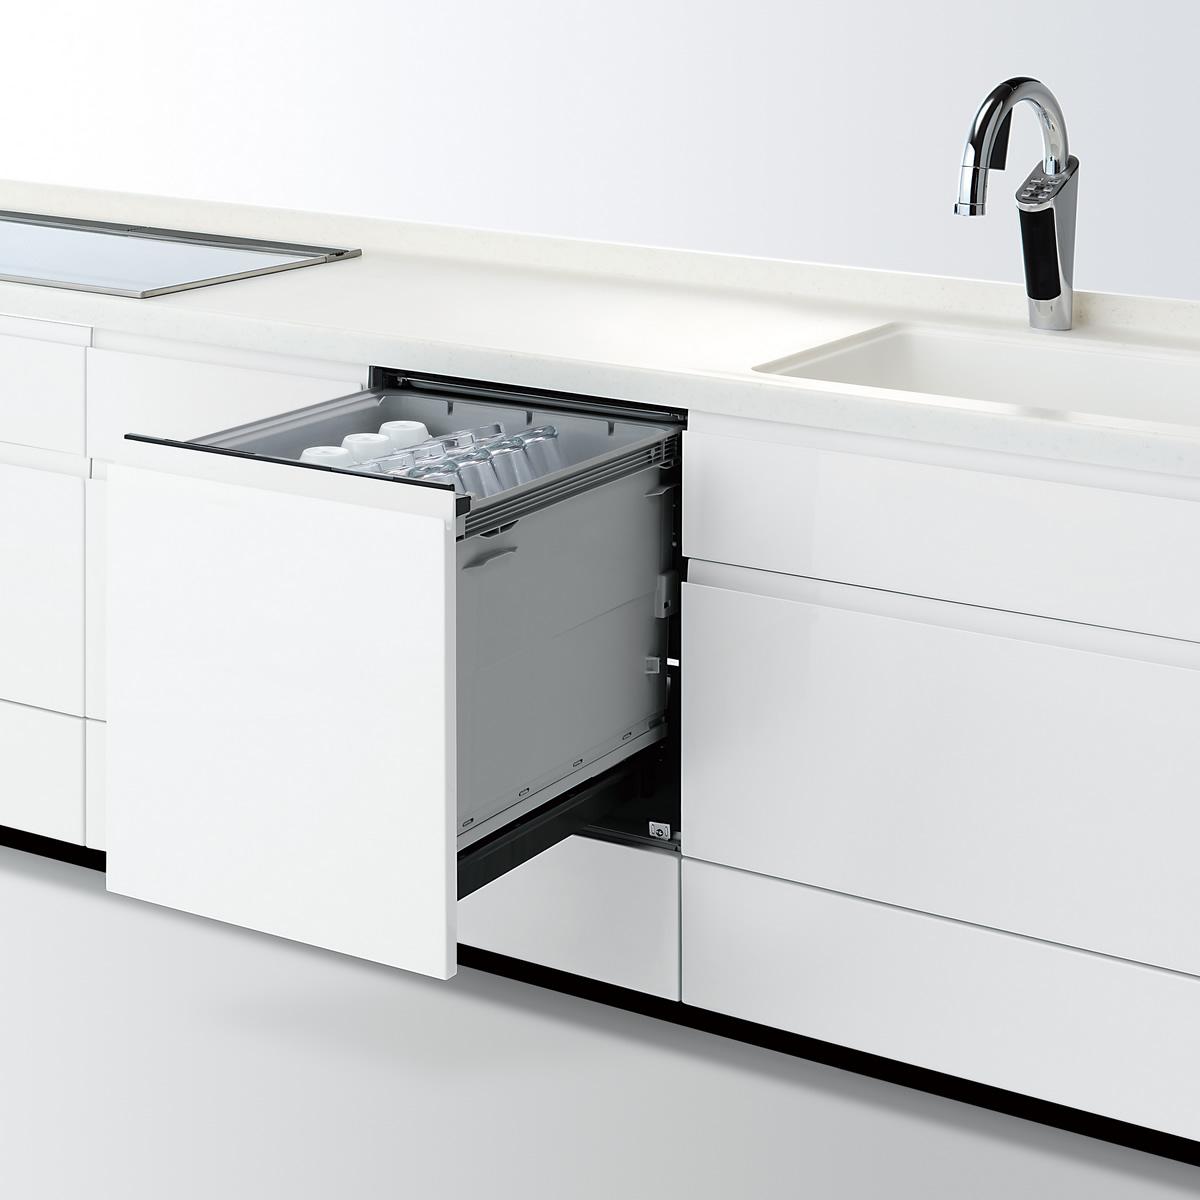 【NP-45KD8W】 パナソニック ビルトイン食器洗い乾燥機(食洗機) K8シリーズ 幅45cm ディープタイプ ドアフル面材型